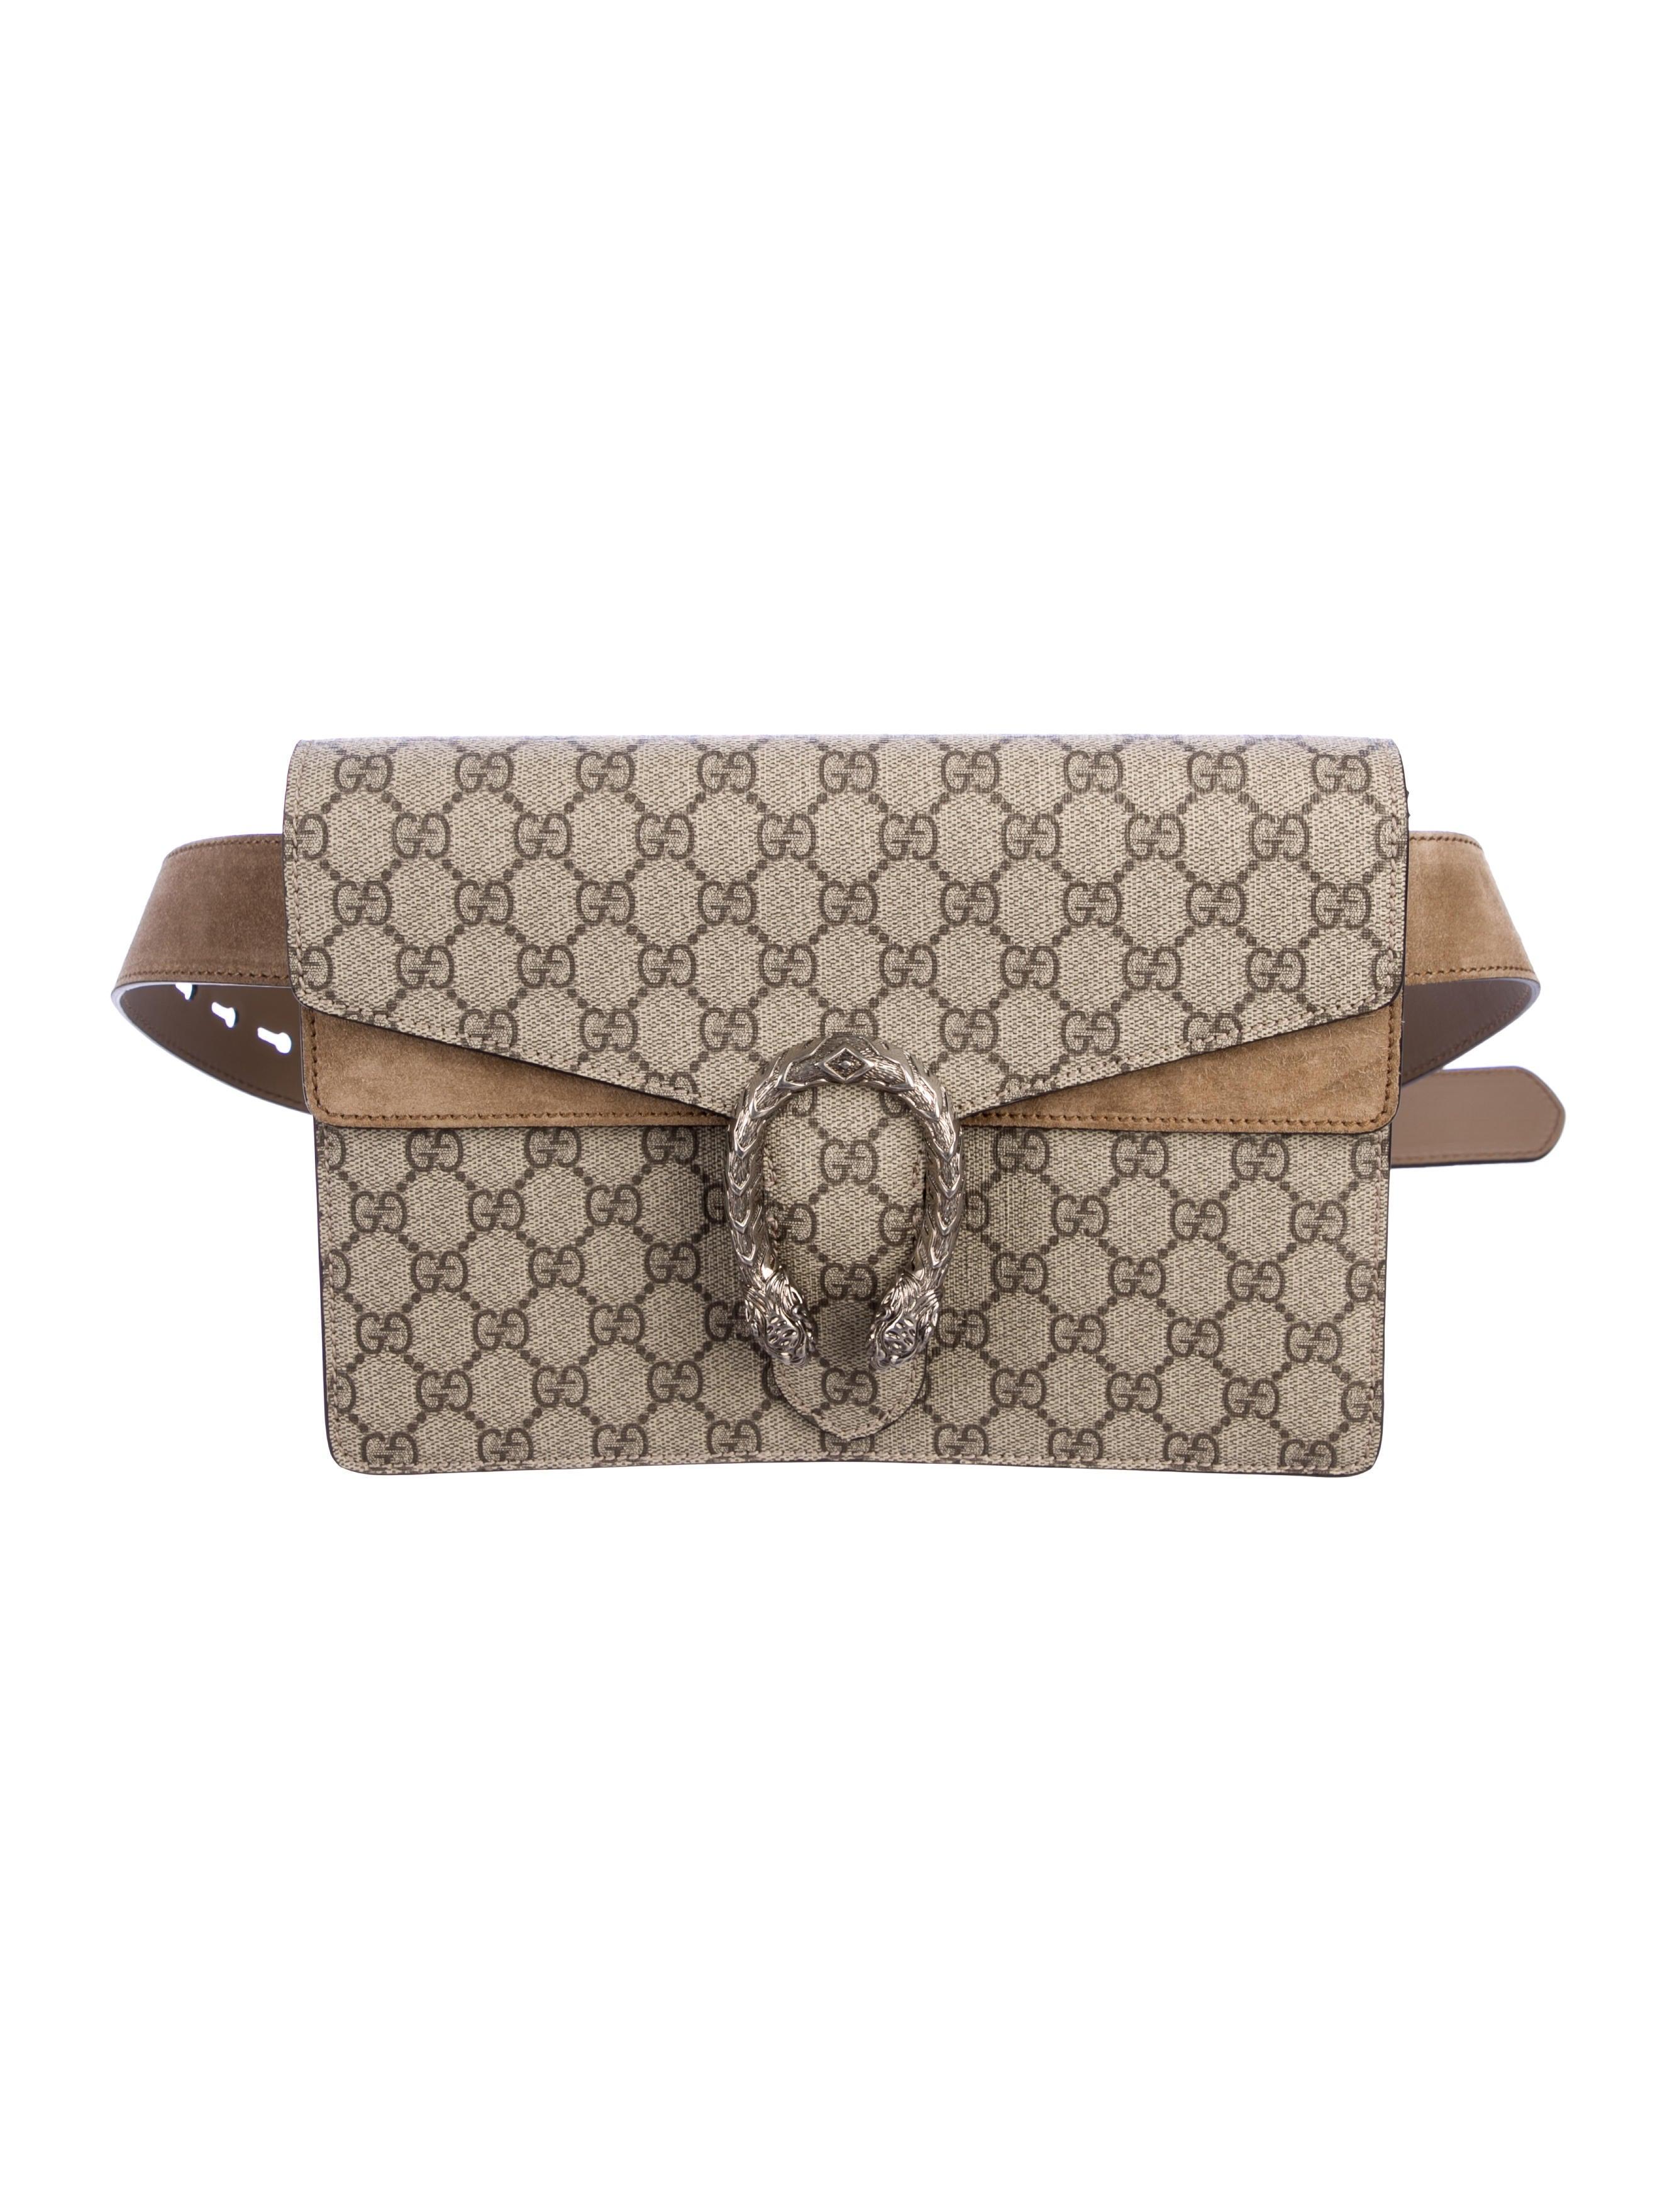 8e557e082 Gucci Dionysus GG Supreme Belt Bag - Handbags - GUC269334 | The RealReal